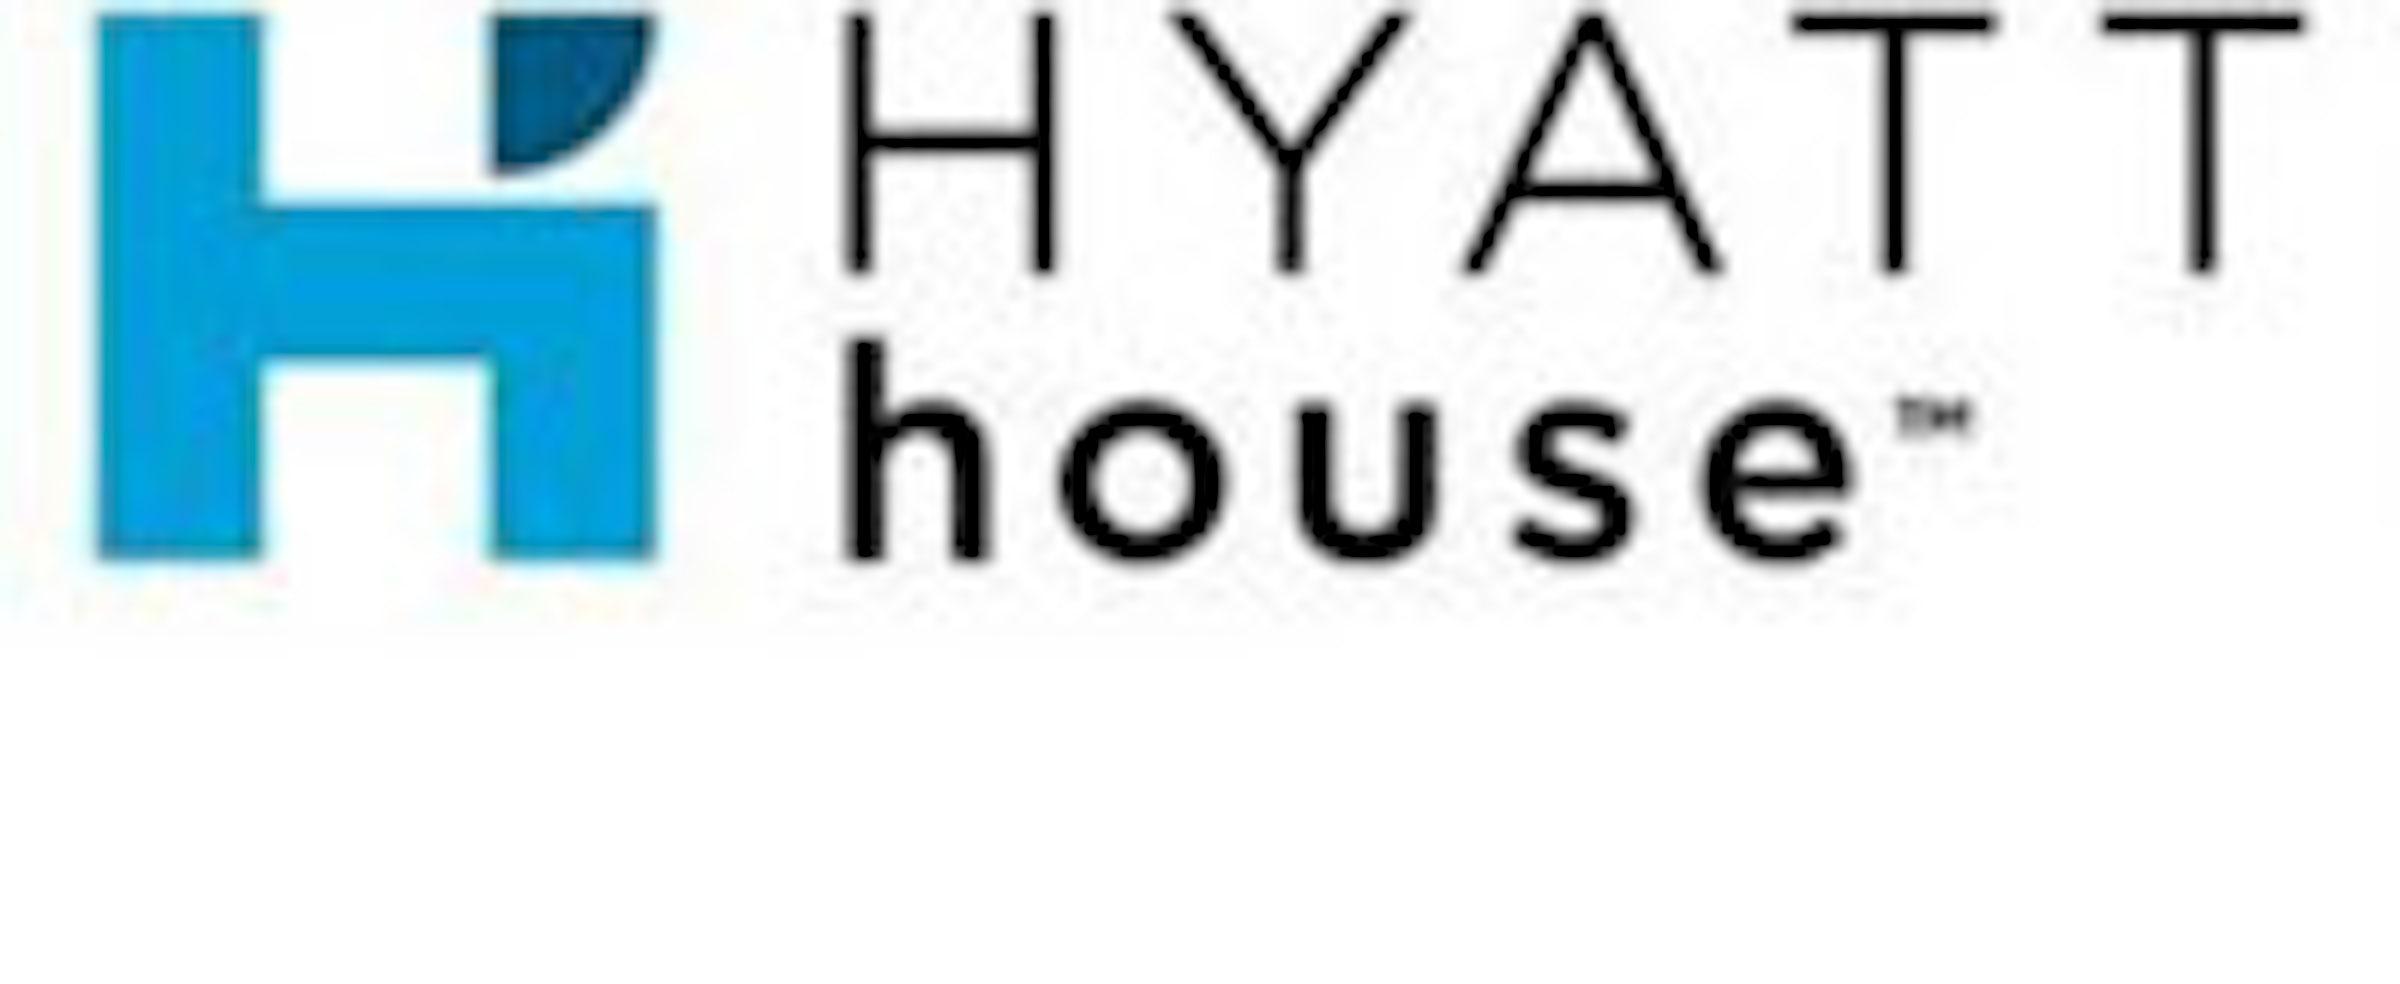 Hyatt House Dallas/Uptown in Beyond Dallas